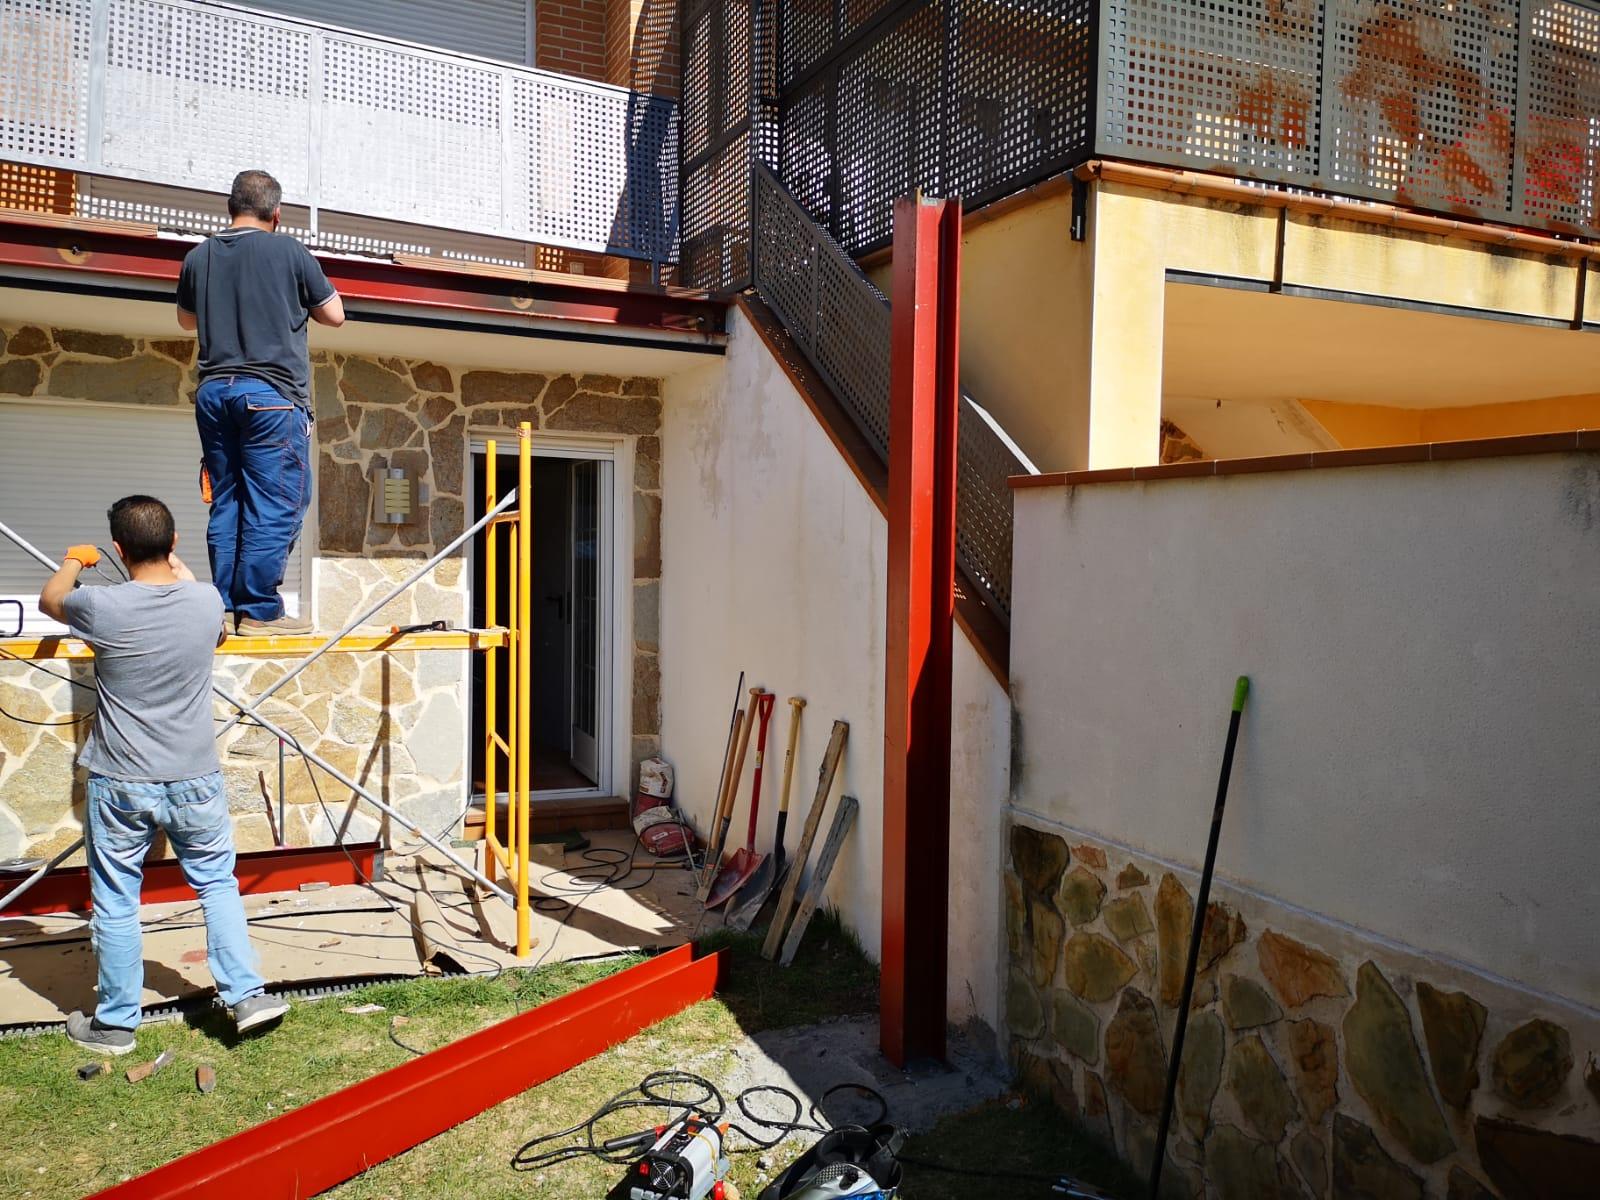 Ampliación De Terraza En Chalet En Estructura Metálica Work